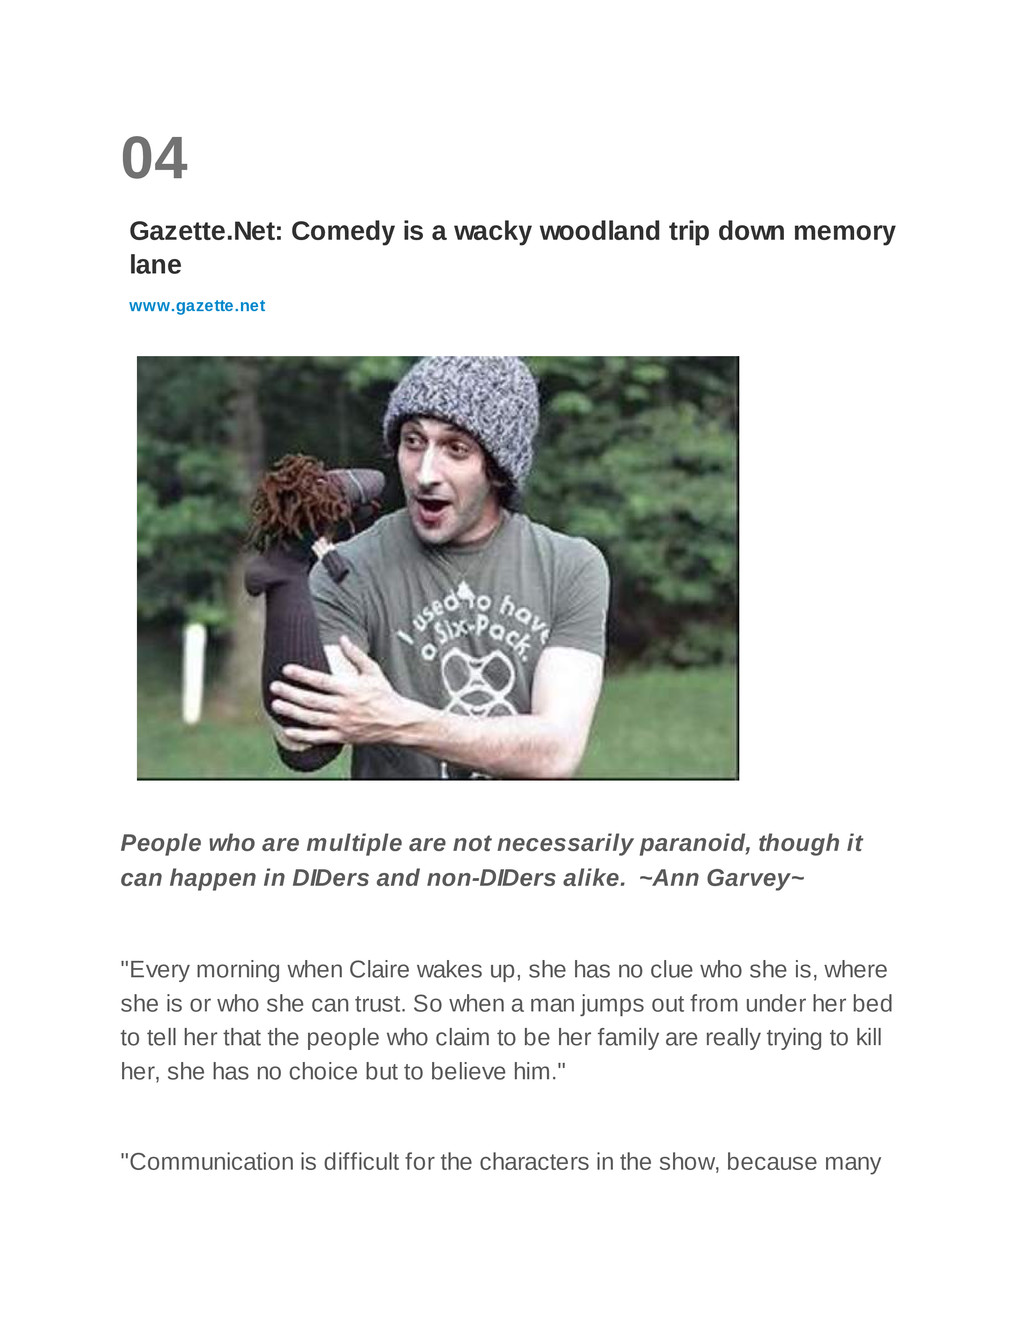 04 Gazette.Net: Comedy is a wacky woodland trip...